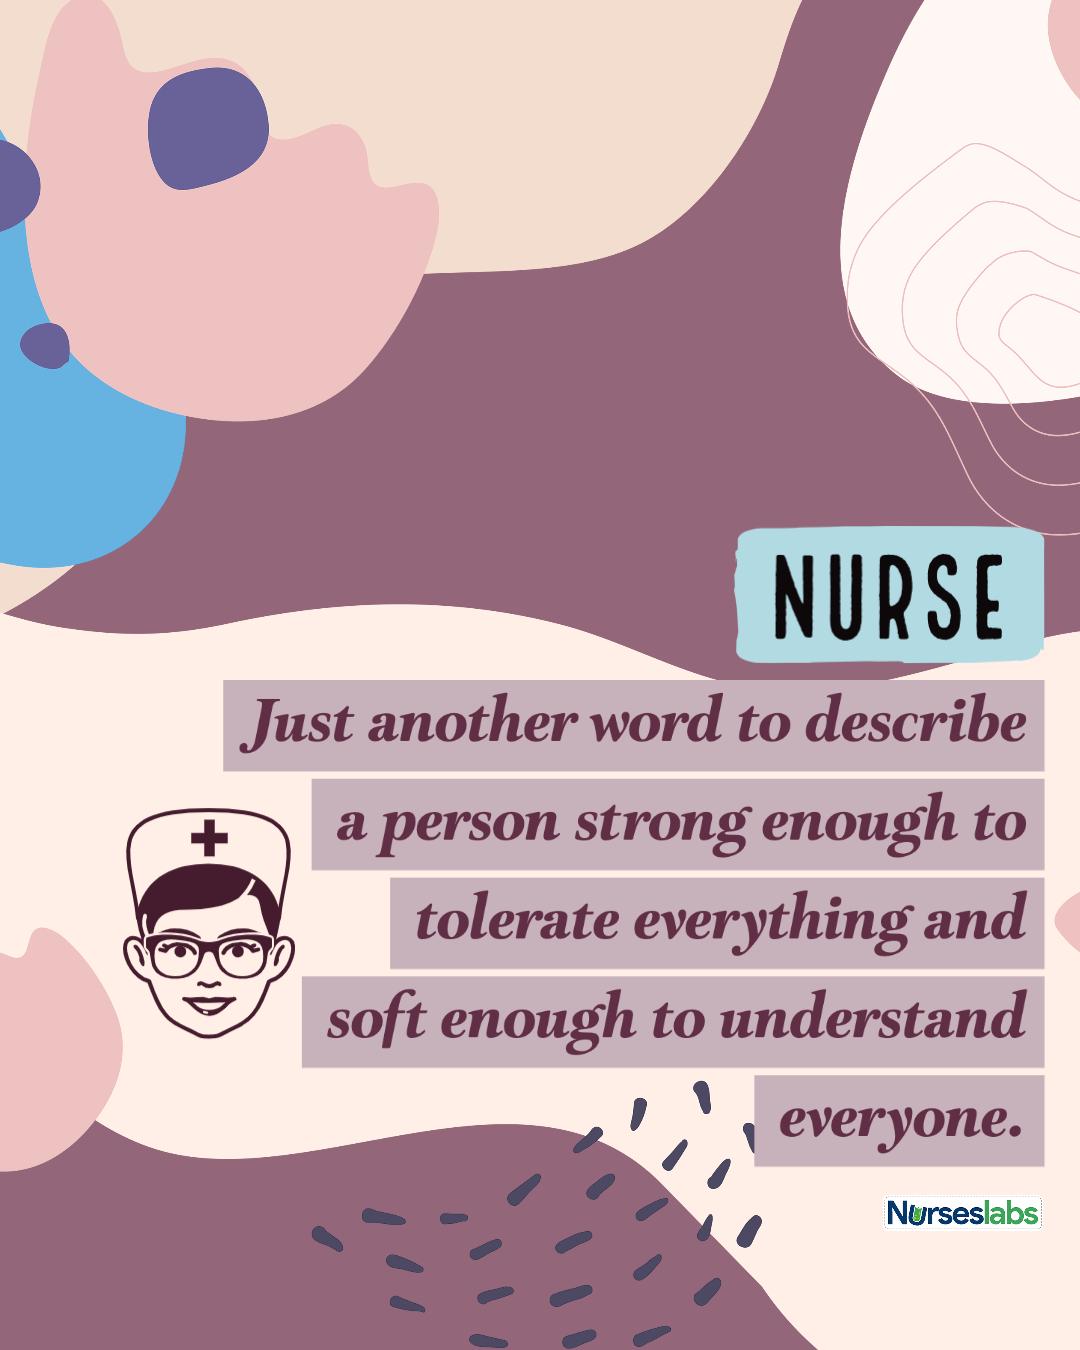 3 Nurse Quotes to Inspire, Motivate, and Humor Nurses - Nurseslabs